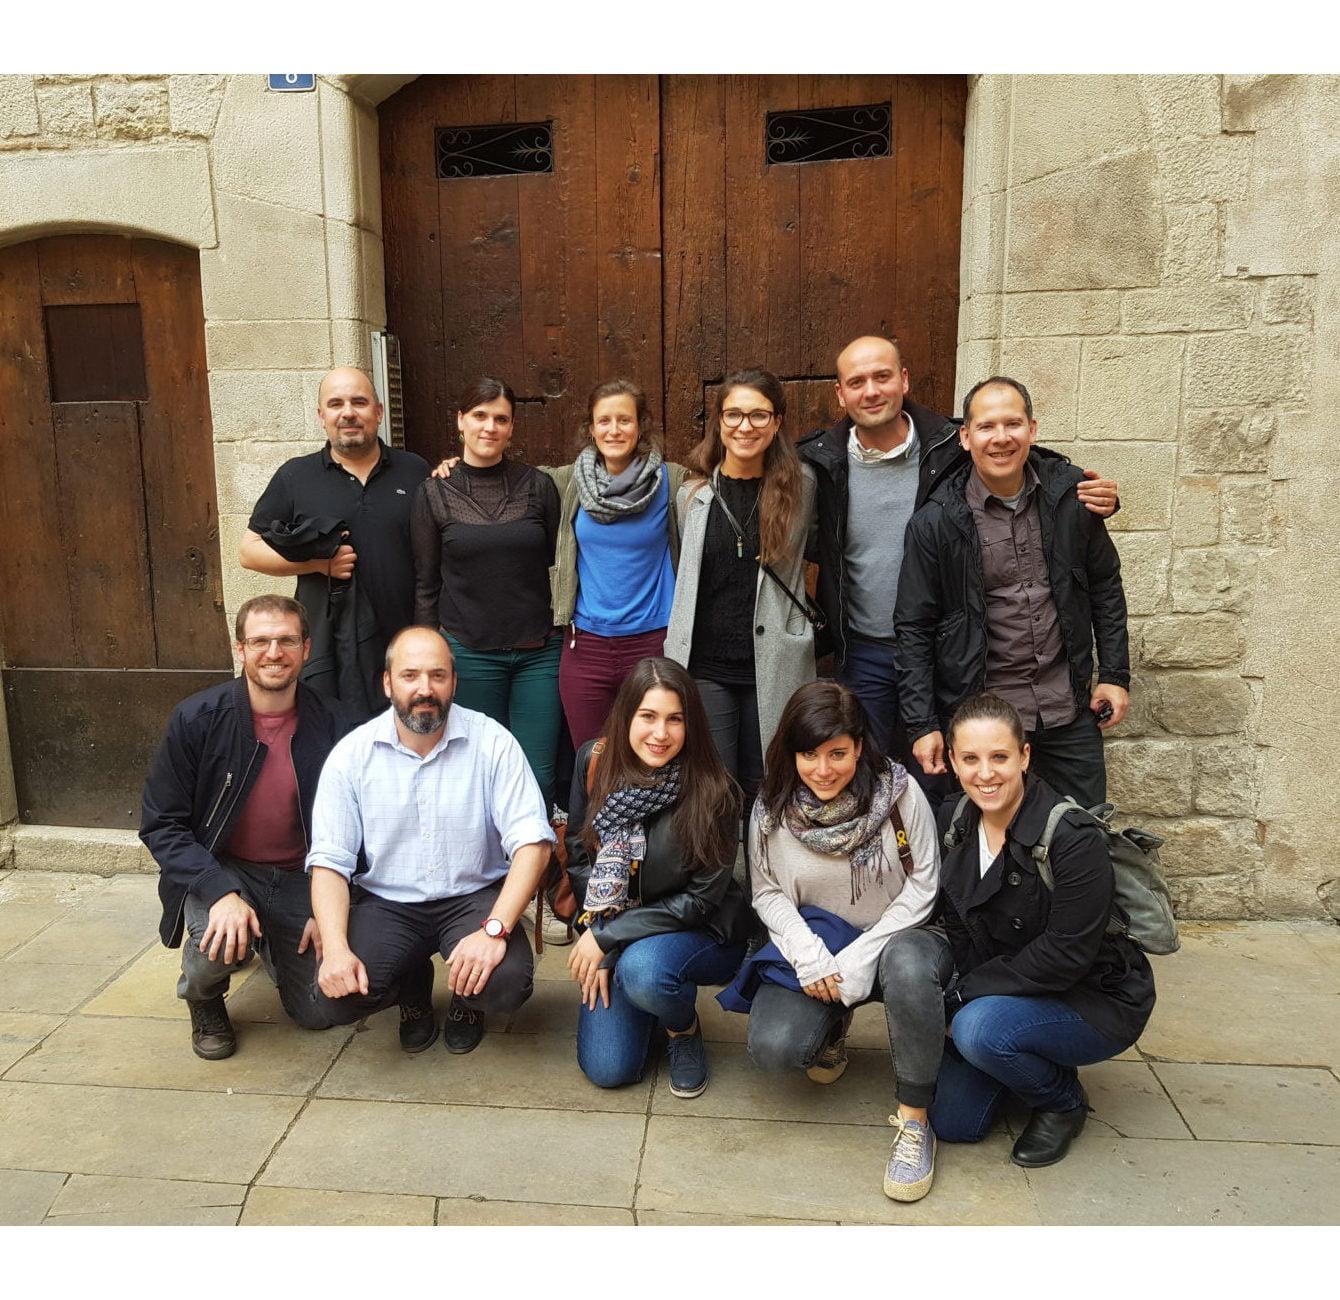 Andrés Martos, Leo Rojas, Gisela Selva, Koldo Crespo, Esther López, Silvia Romero y Miguel Gadea